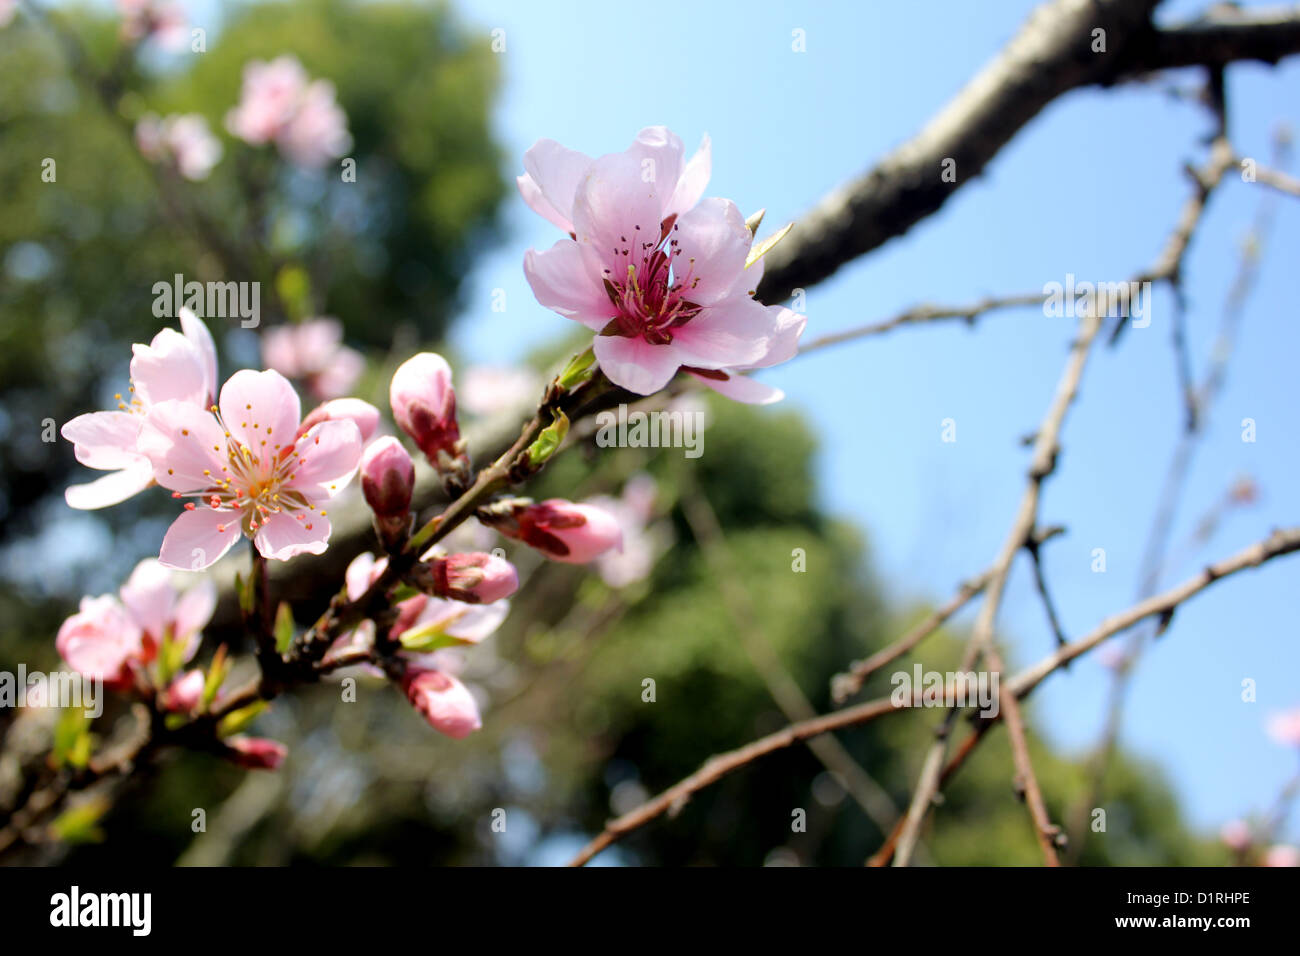 Cherry blossom flowers at century park shanghai china in spring cherry blossom flowers at century park shanghai china in spring mightylinksfo